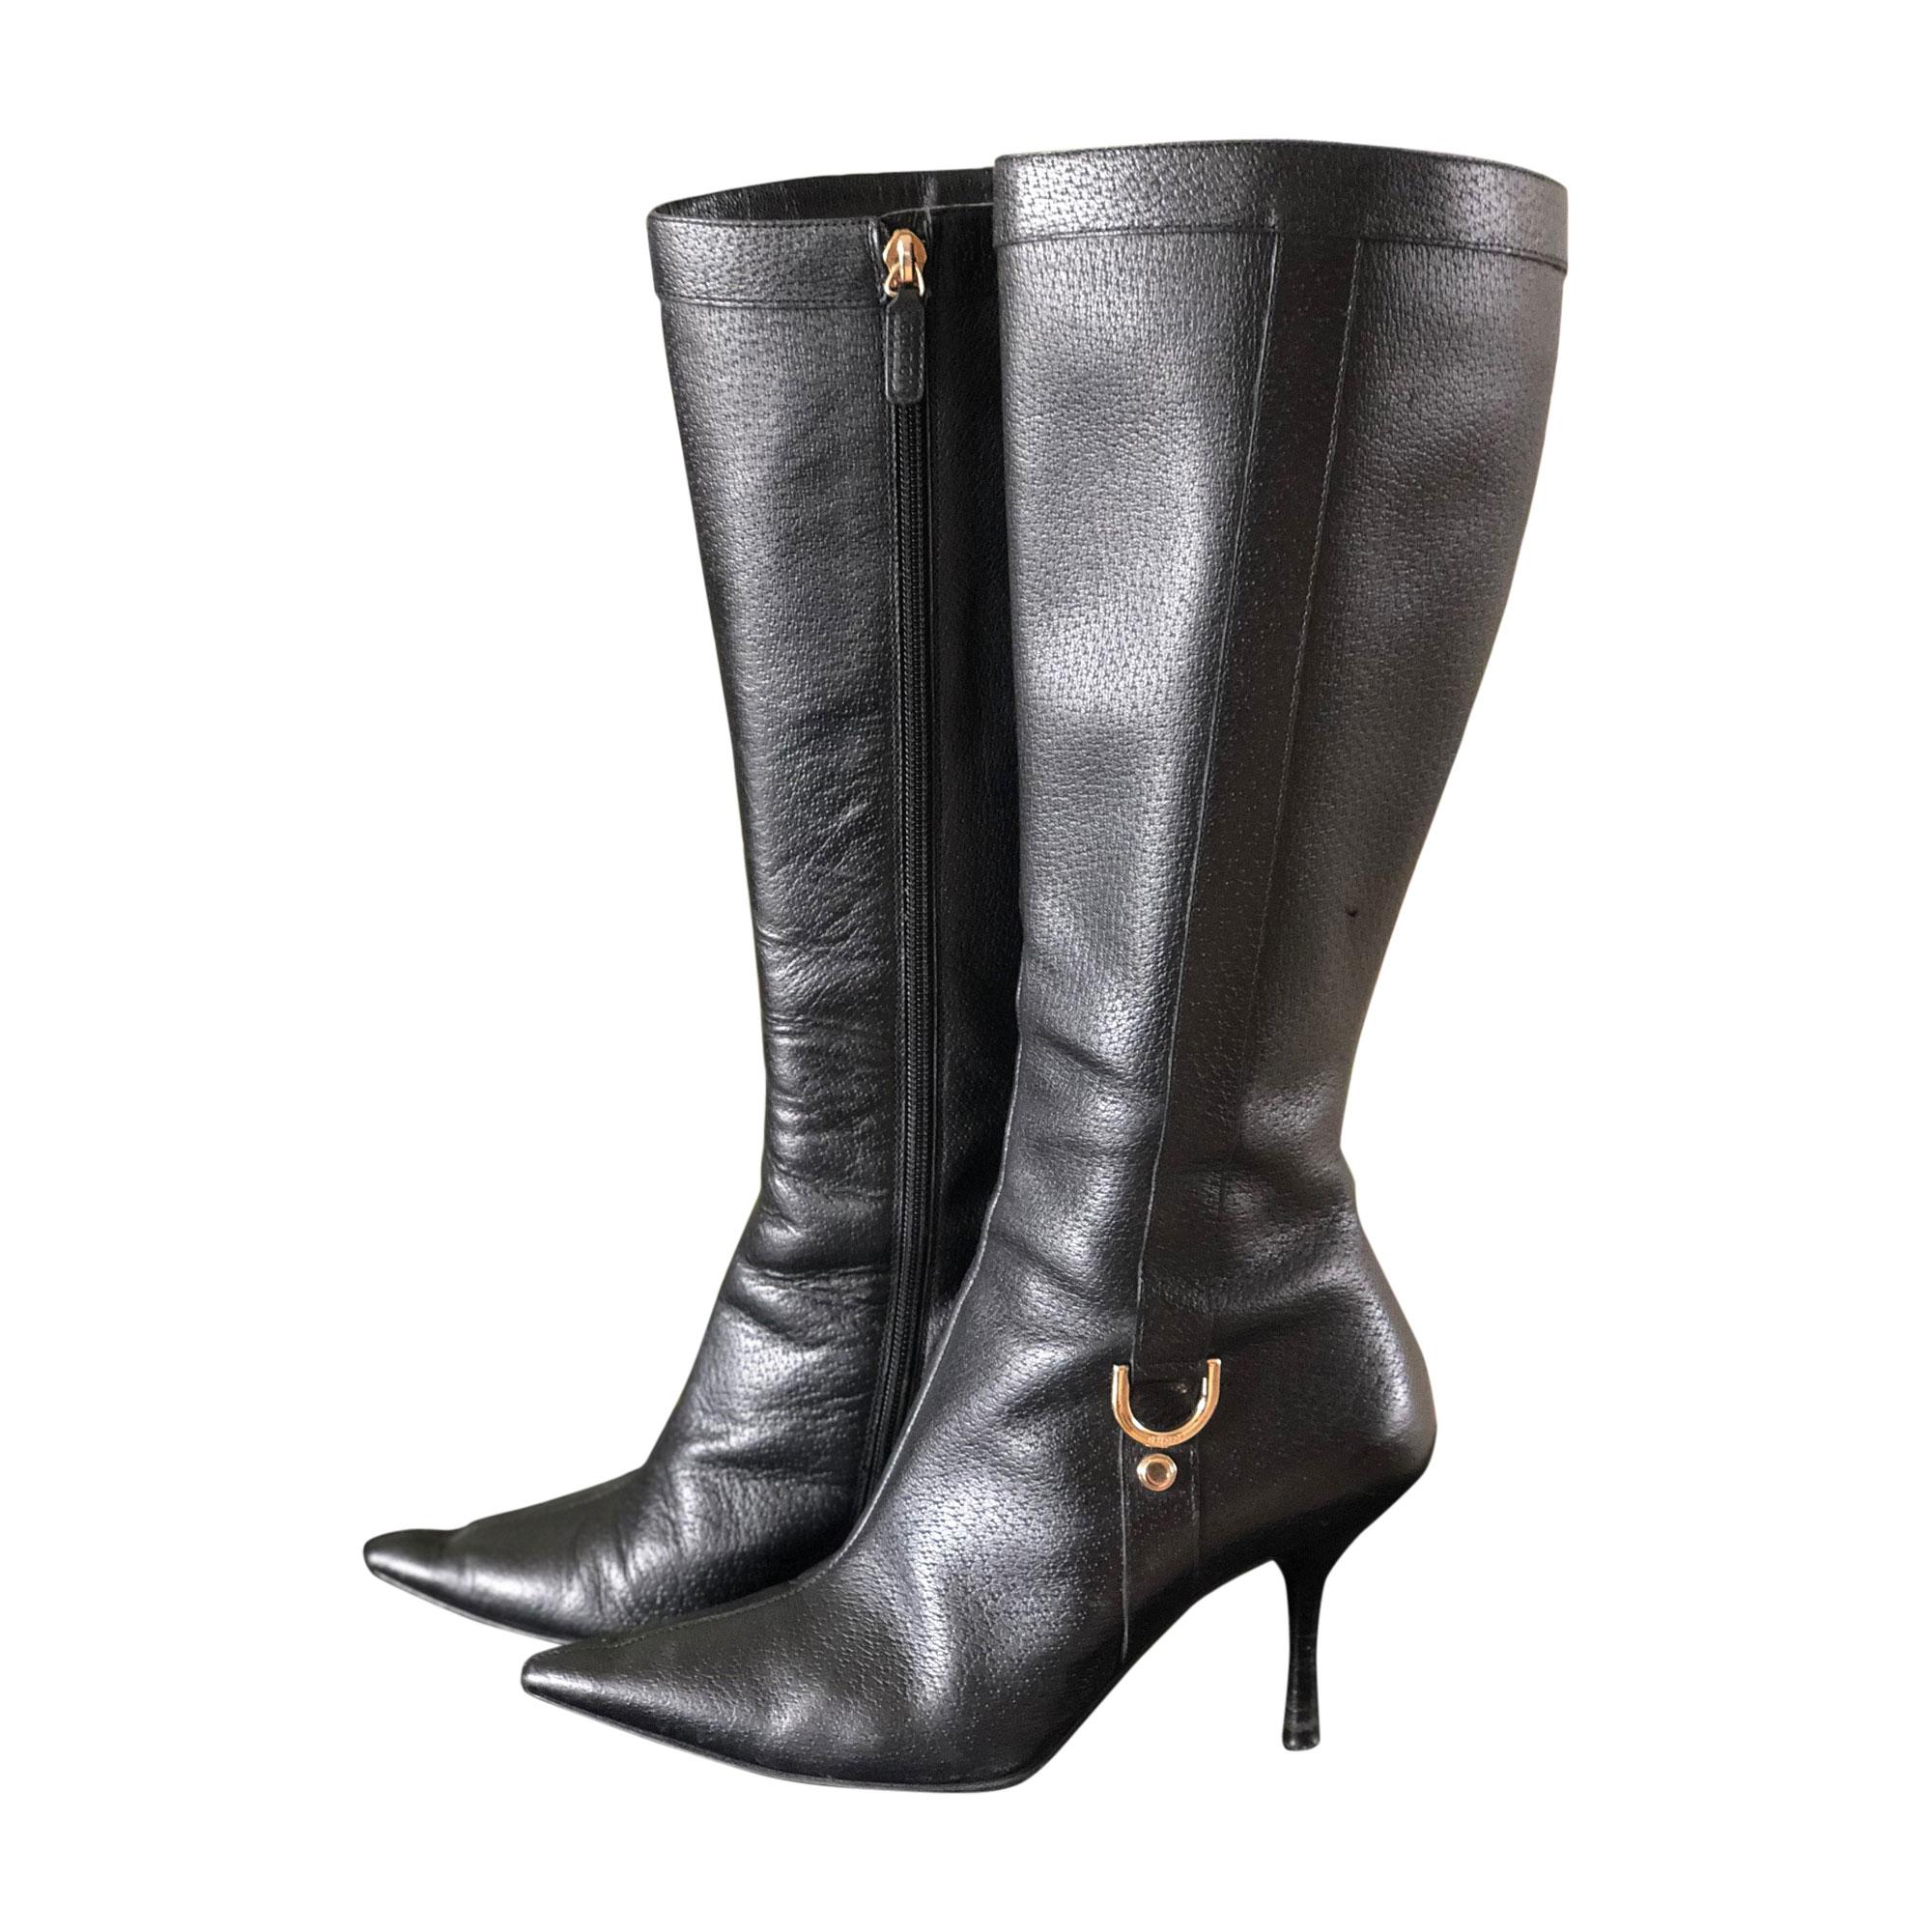 a88376b0458b High Heel Boots GUCCI 37 black - 7707938